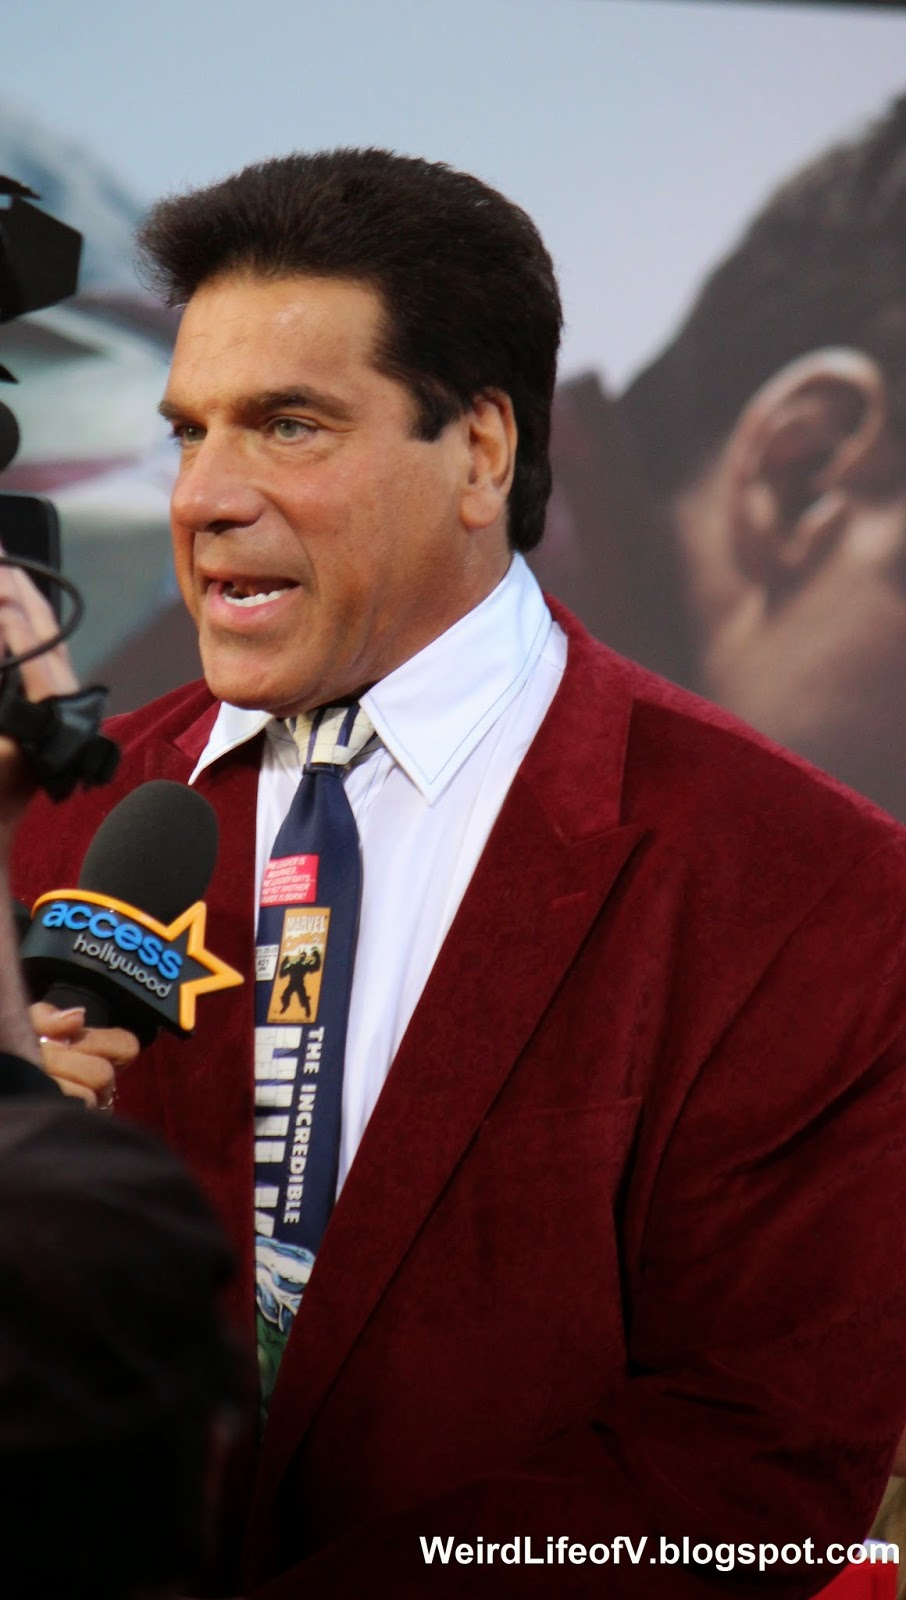 Lou Ferrigno wearing an Incredible Hulk tie